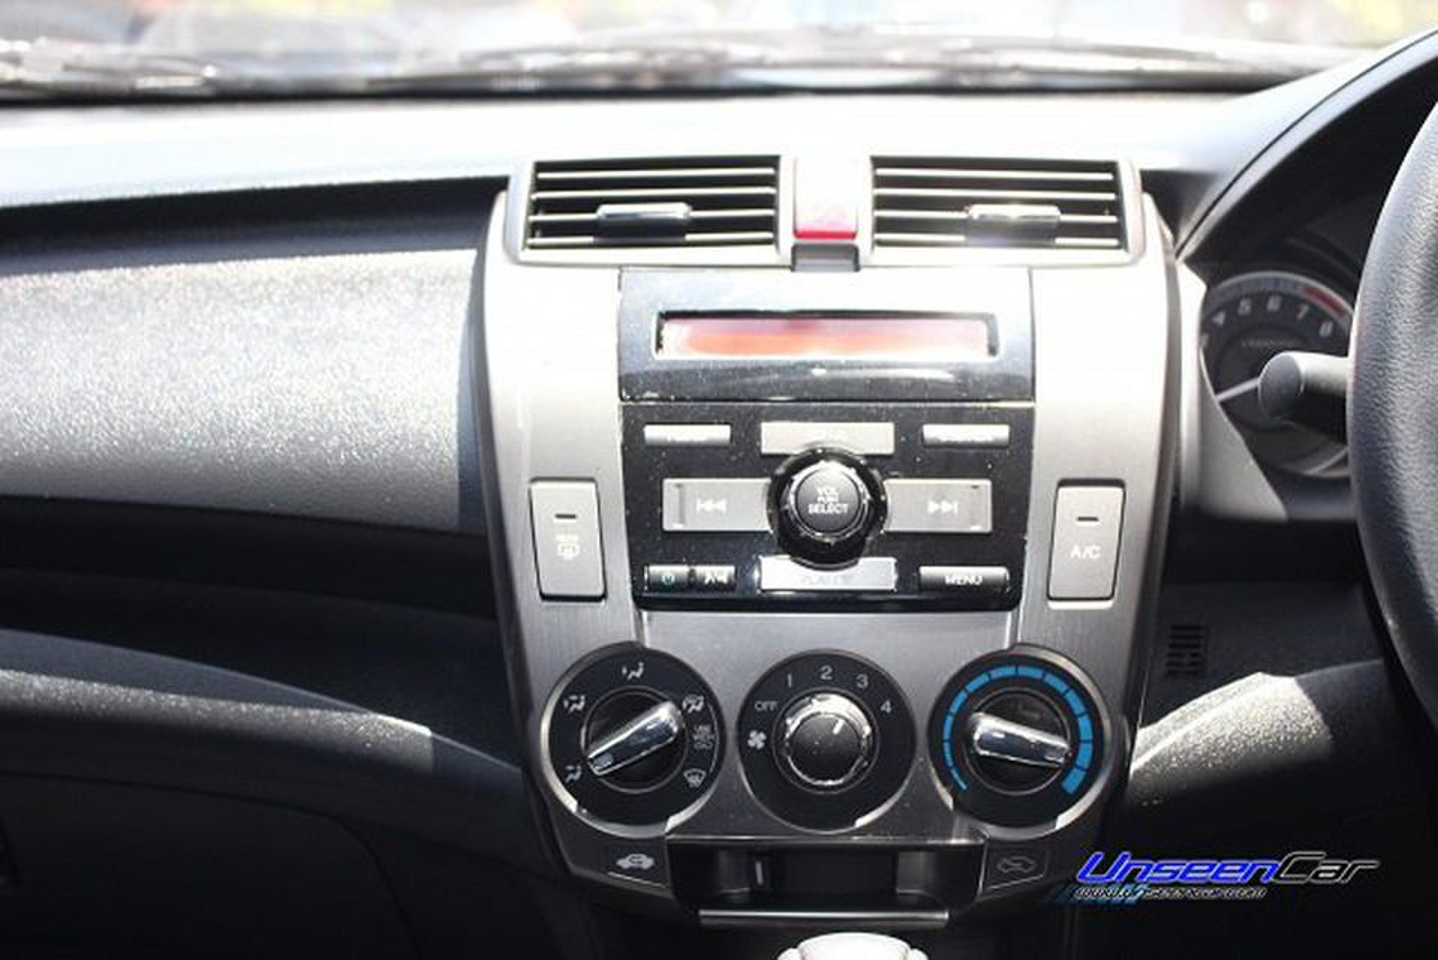 HONDA CITY i-VTEC 1.5 [SV] (BEST CARS AUTO 15) รูปที่ 6